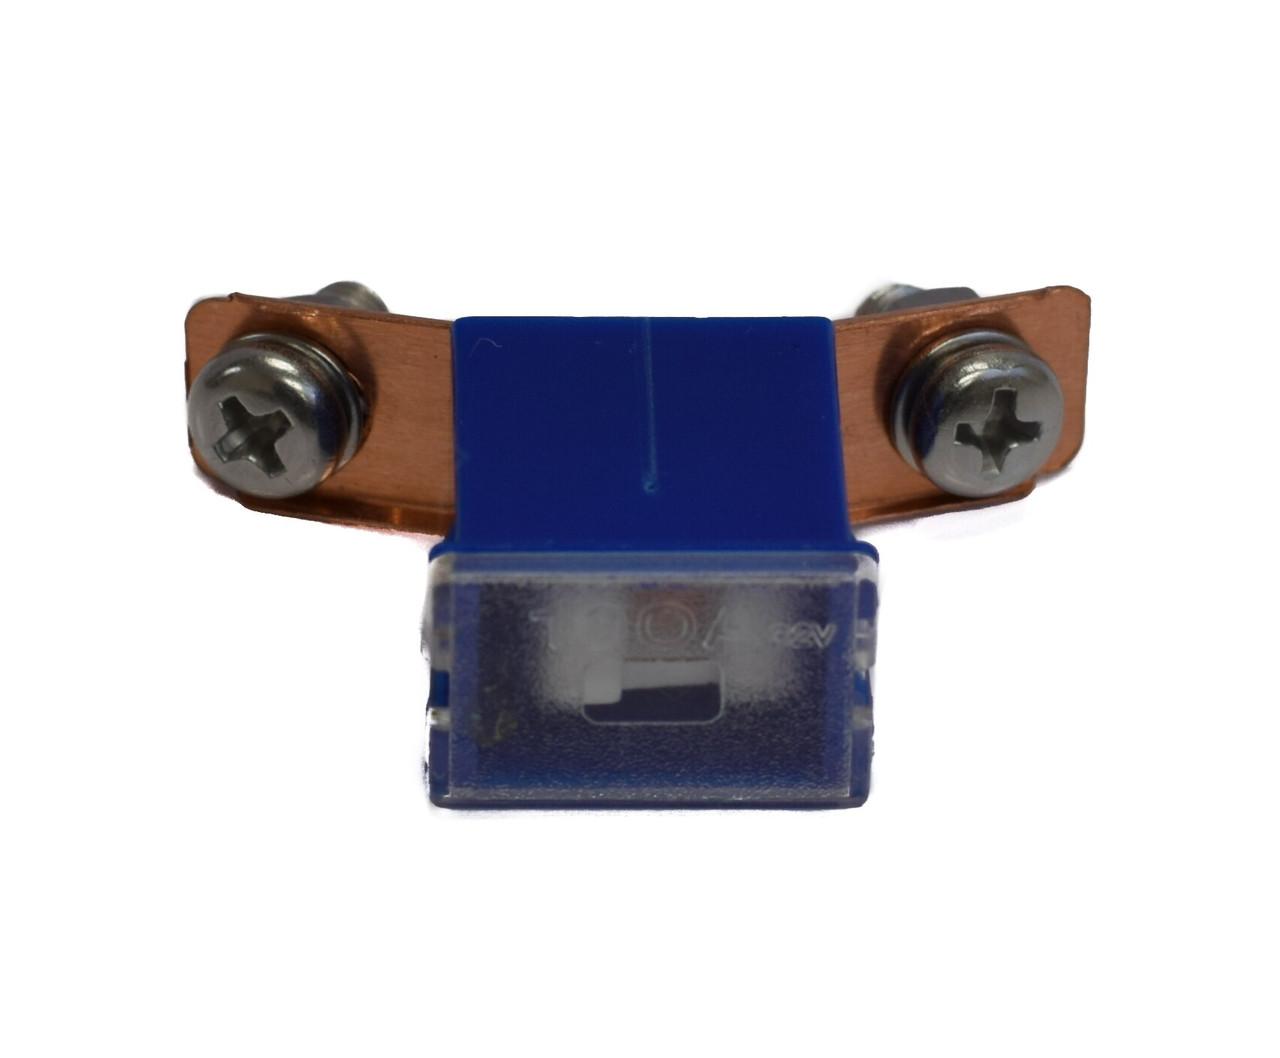 Raion Power RBC7 100A Fuse Includes Nuts & Bolts For APC SU700XLNET